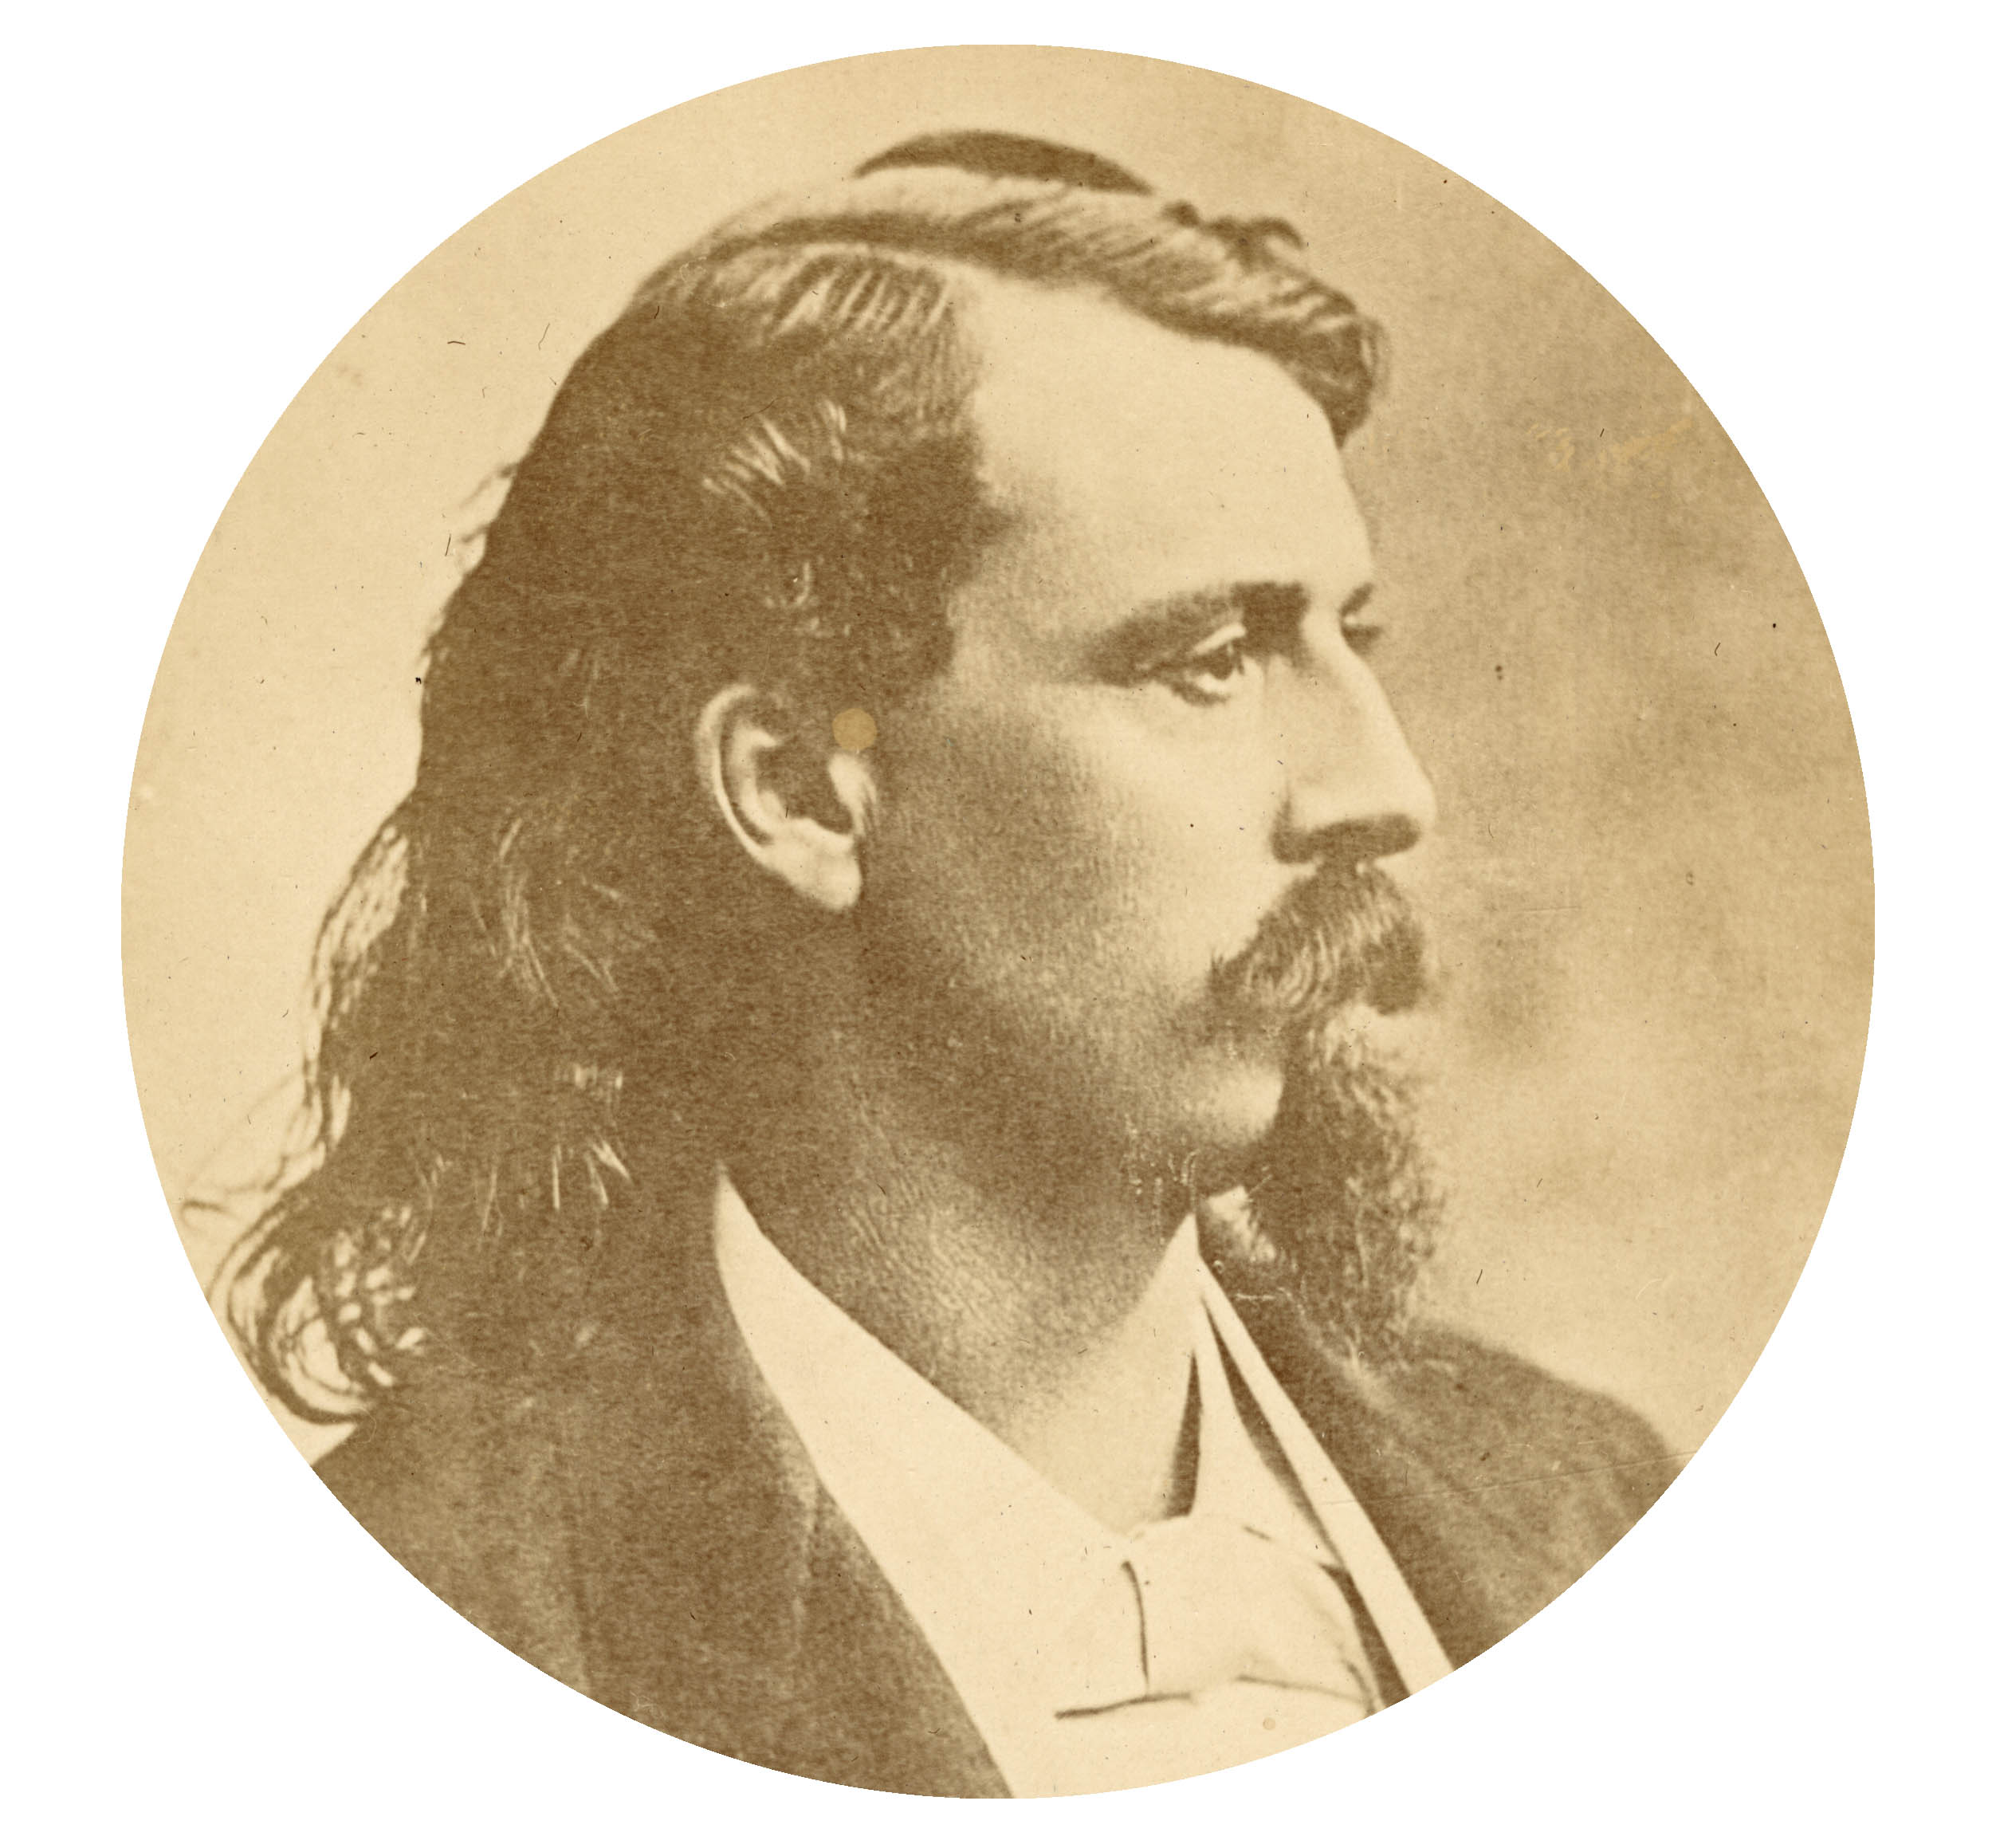 William Buffalo Bill Cody